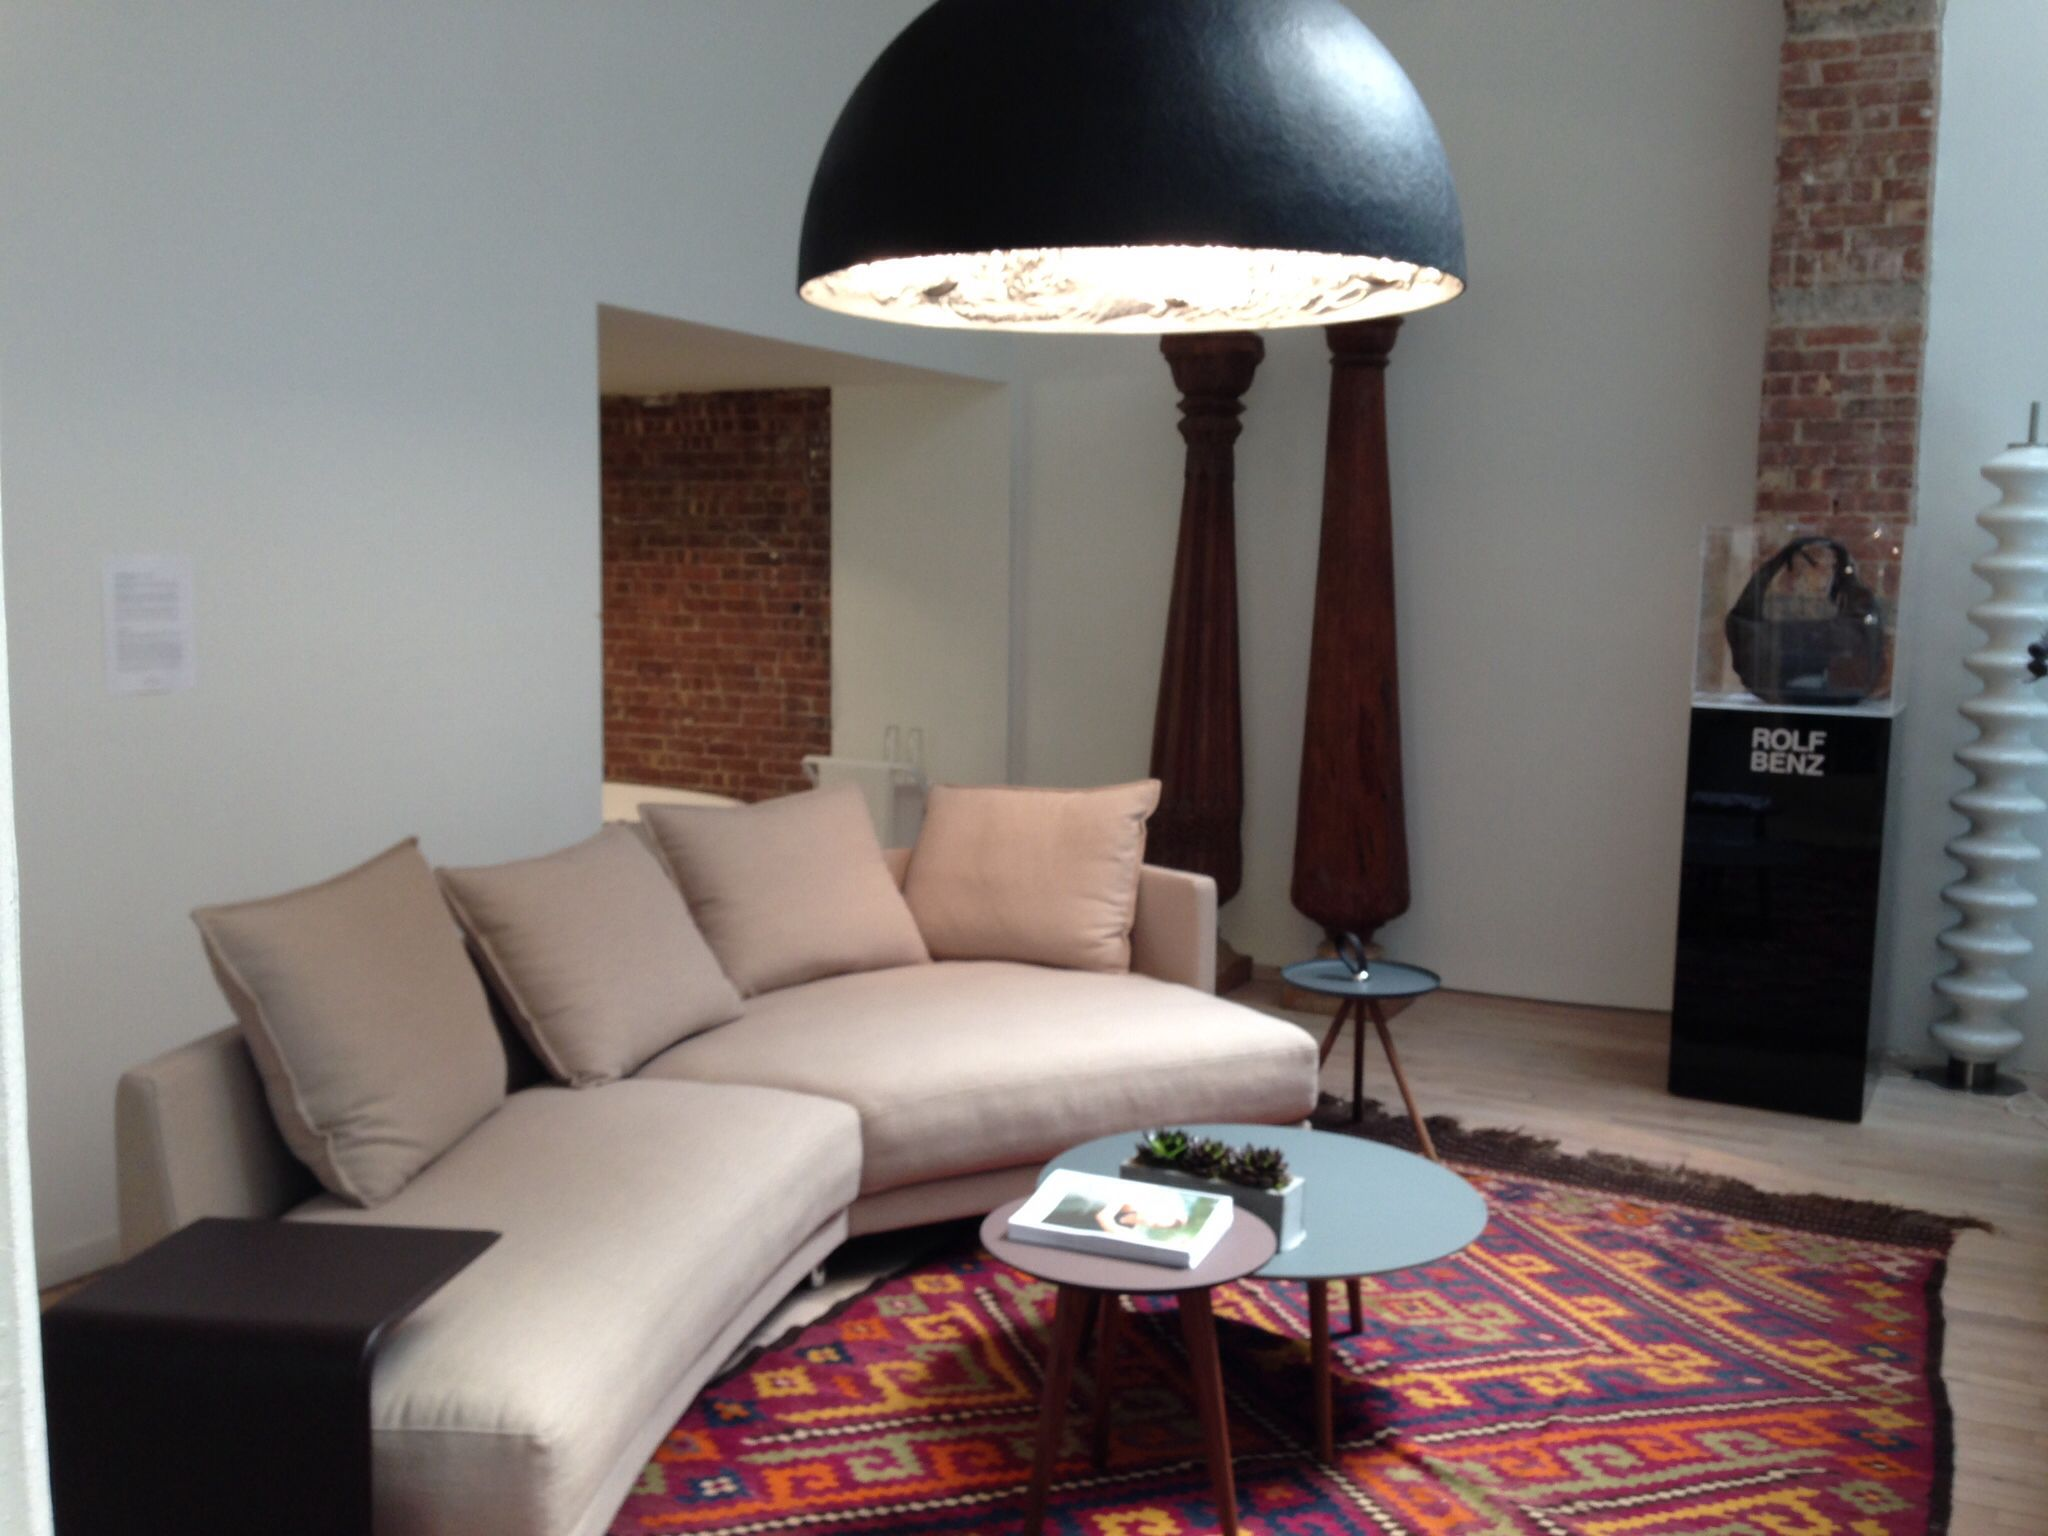 baxton studio iona mid century retro modern. Studio Anise Rolf Benz 50 Sofa. Onda Curved Sofa By At Baxton Iona Mid Century Retro Modern